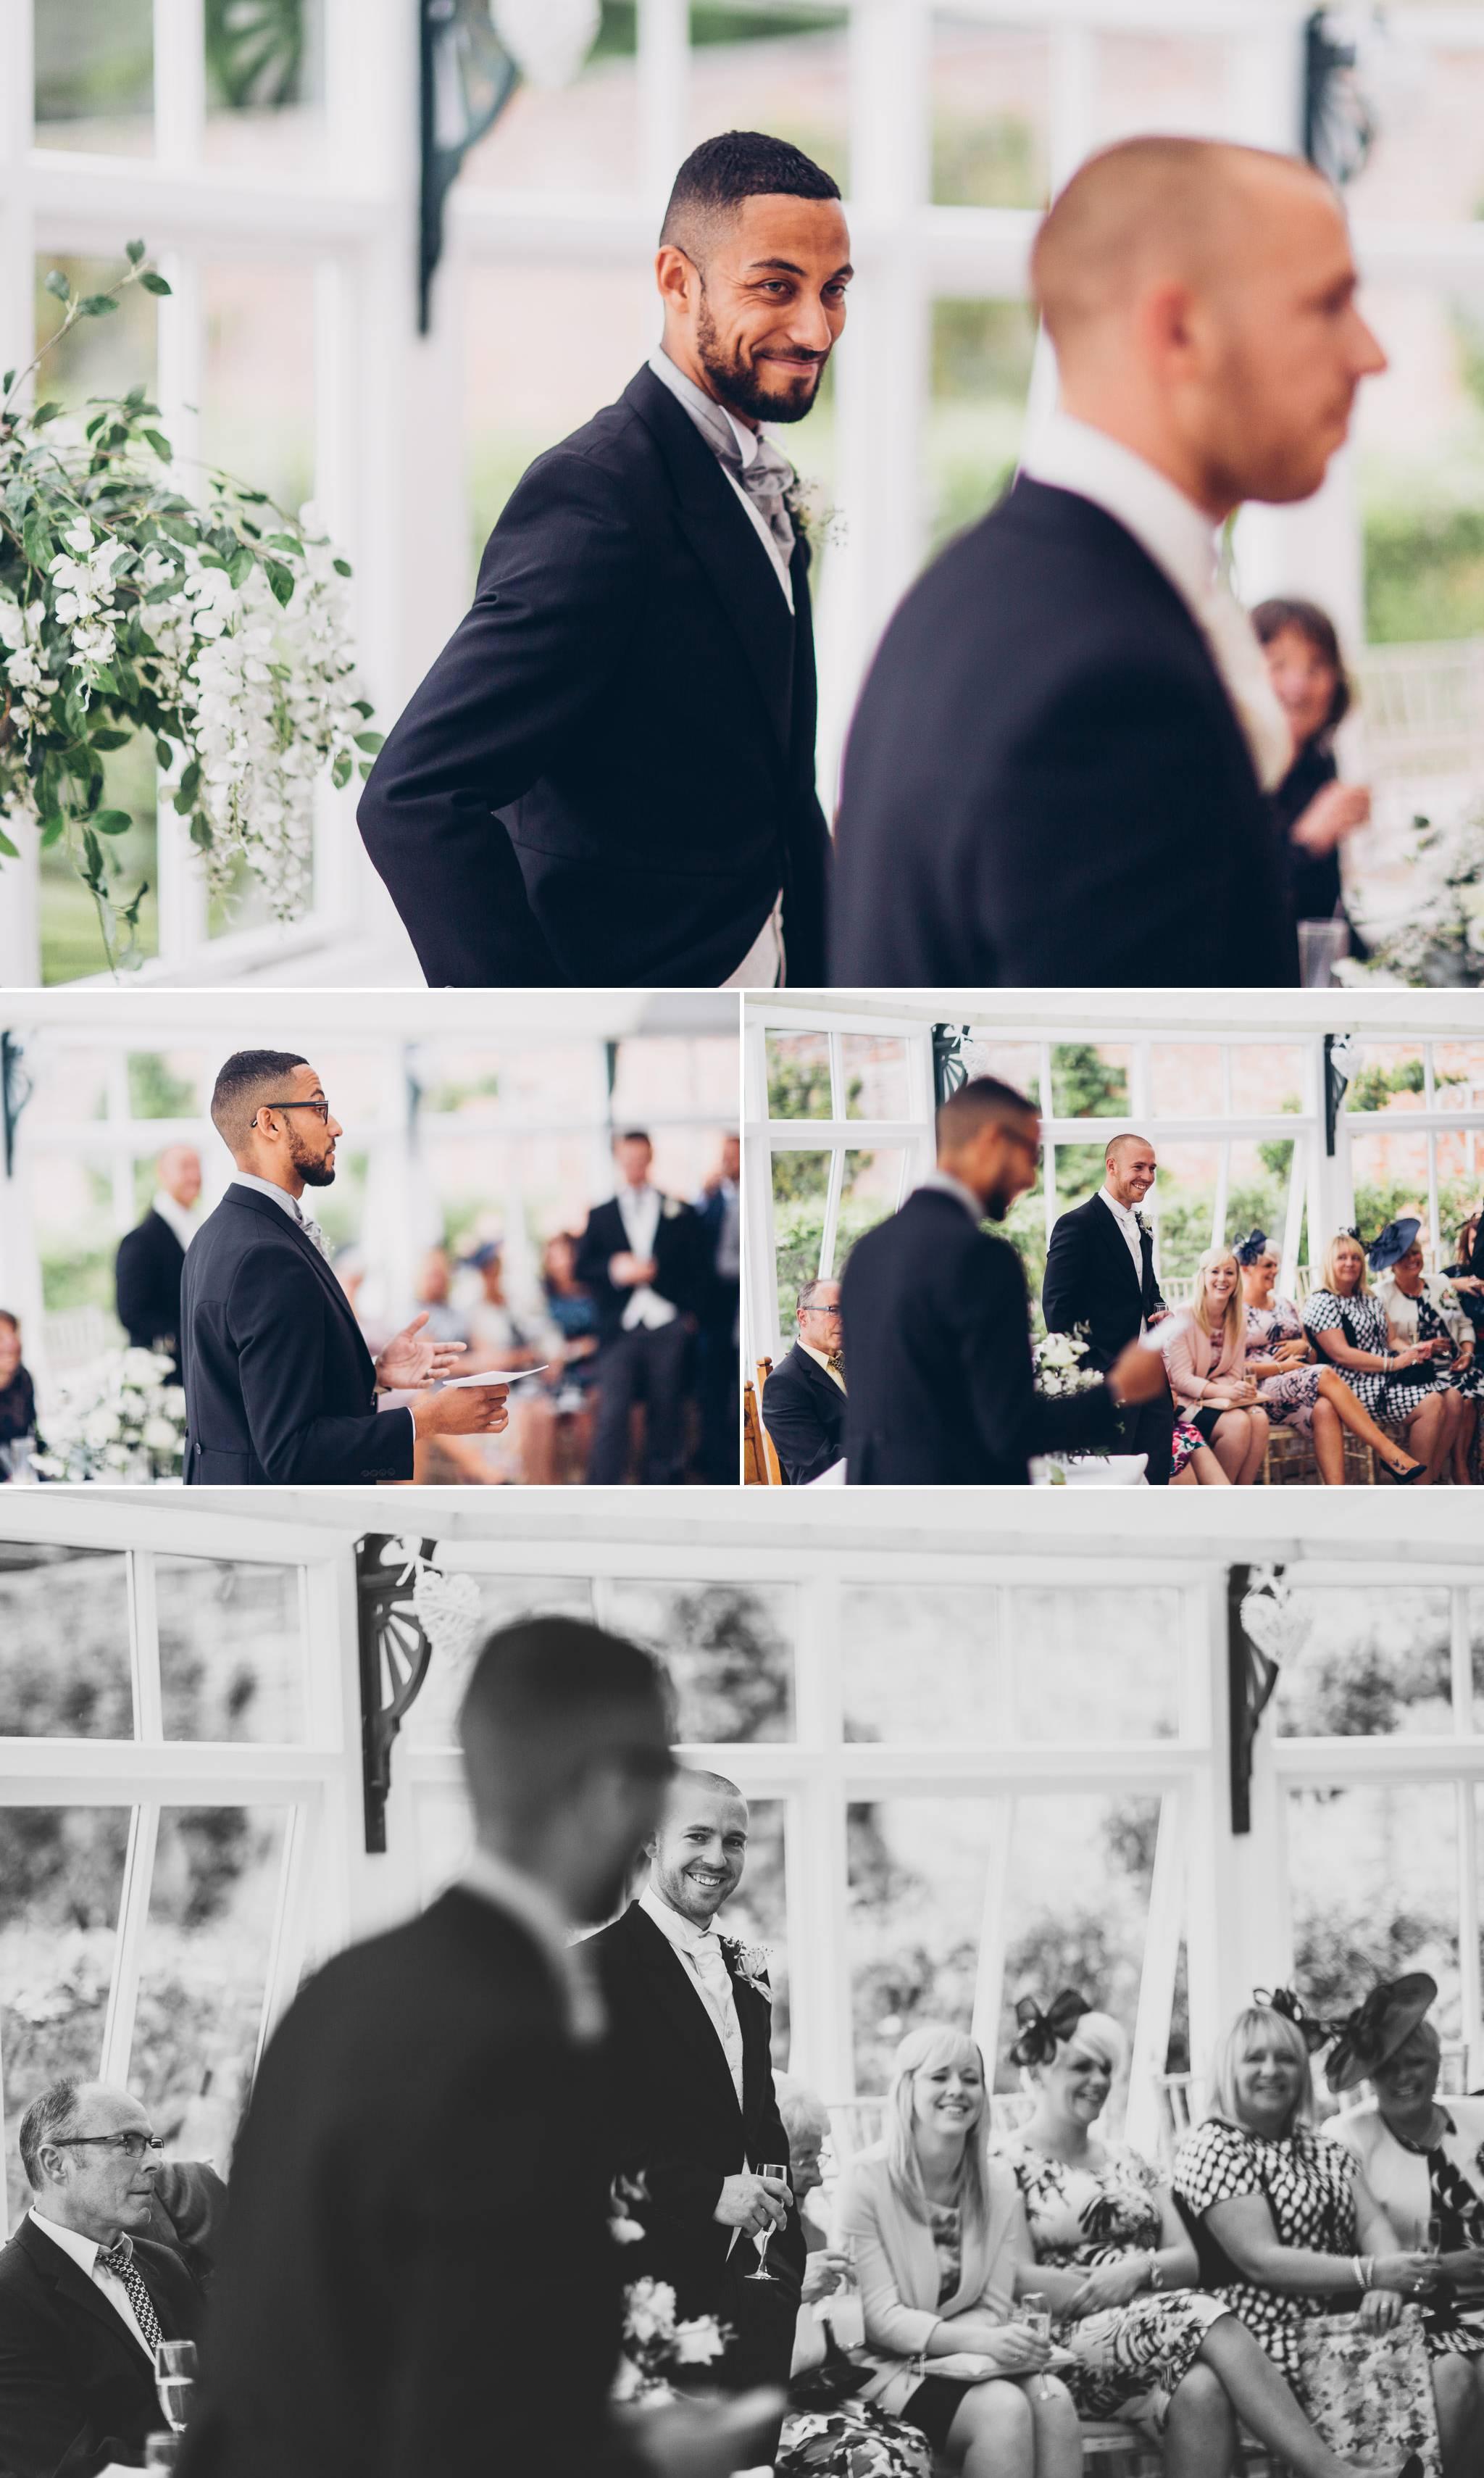 shropshire-wedding-photography 25.jpg